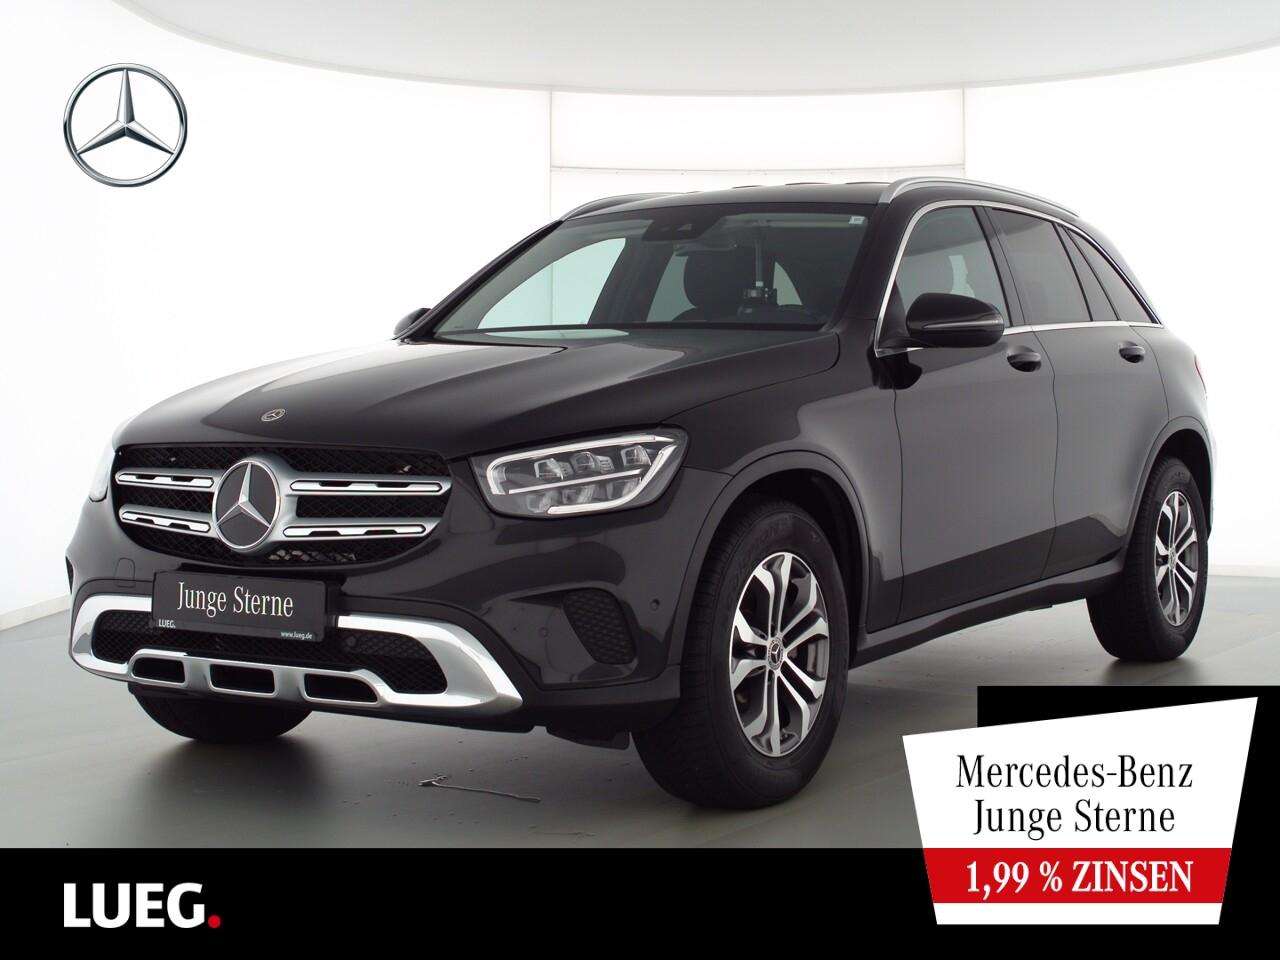 Mercedes-Benz GLC 220 d 4M MBUX+Navi+LED-HP+Sthzg+EHeck+Kamera, Jahr 2020, Diesel